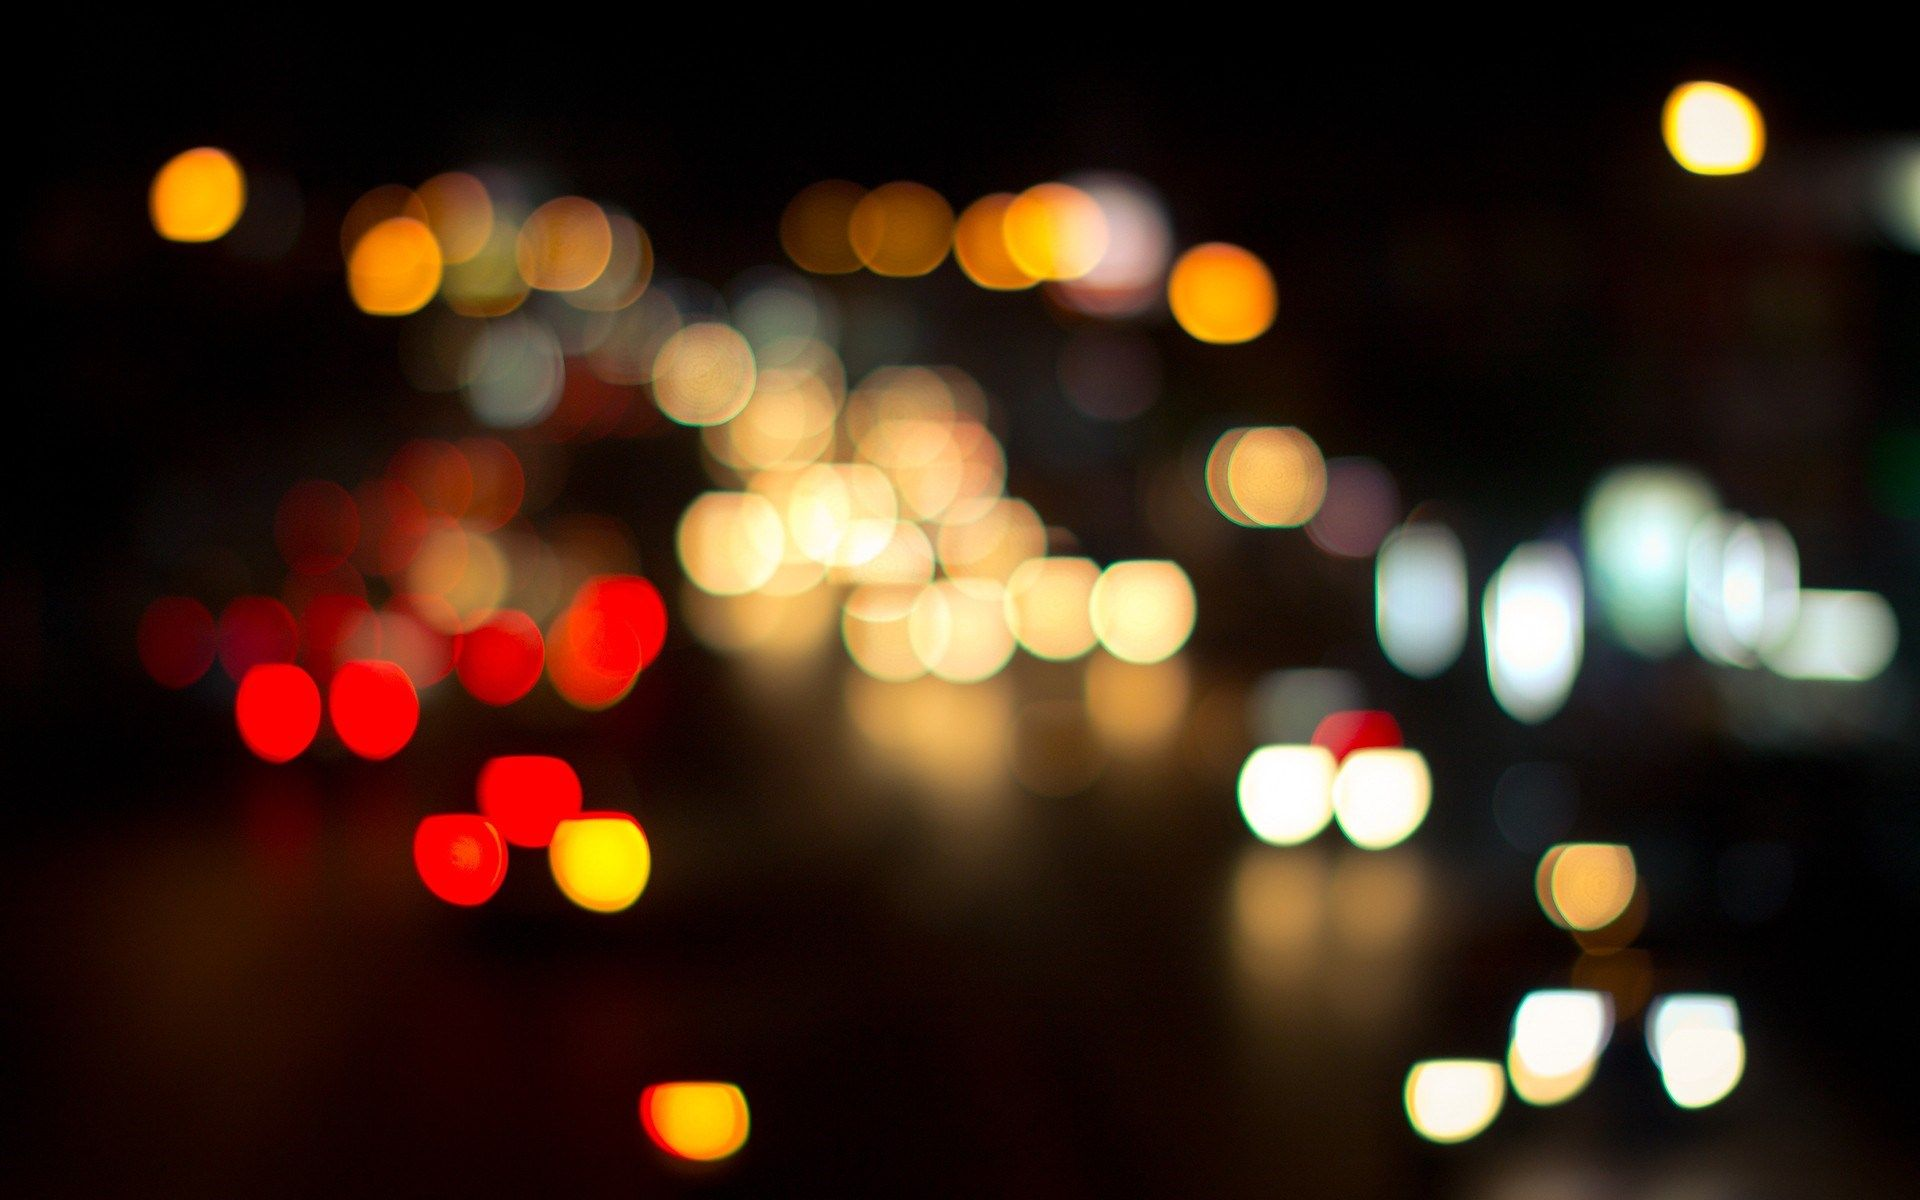 City Lights Nighttime Bokeh